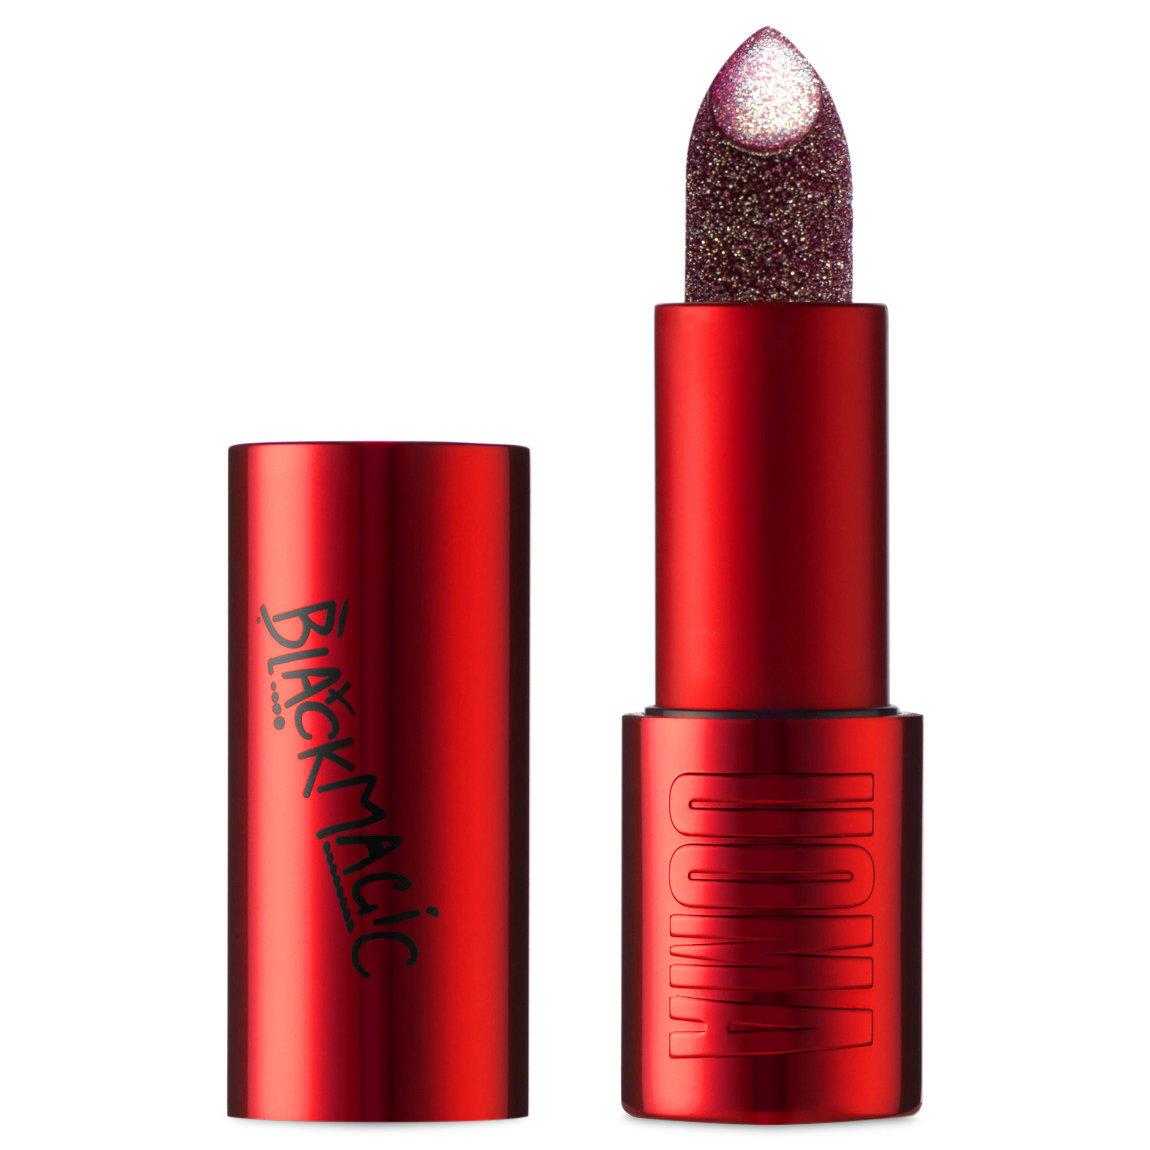 UOMA Beauty Black Magic Lipstick Hypnotic Impact Metallic Lipstick Bahia alternative view 1 - product swatch.